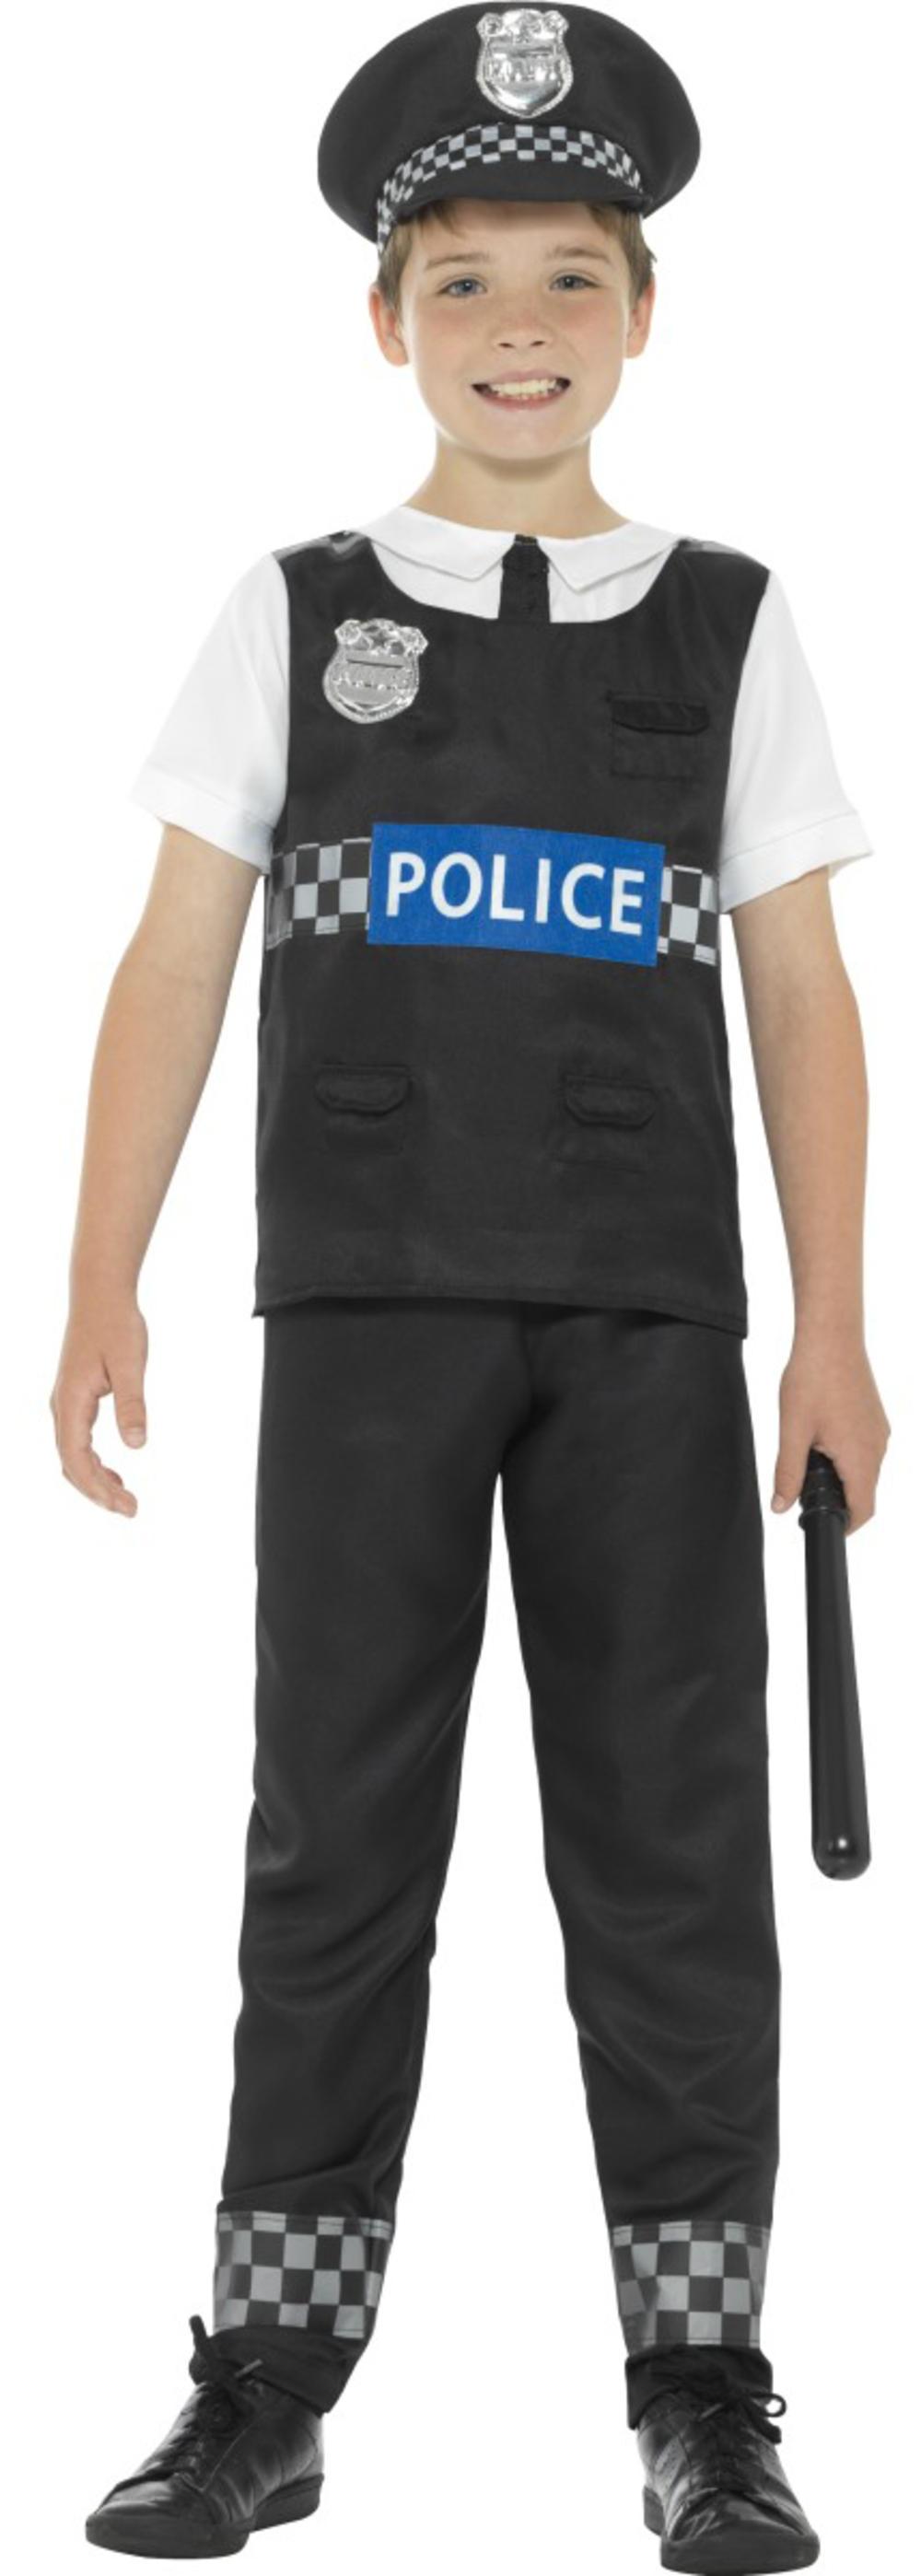 Cop Boys Fancy Dress Policeman Officer Uniform Occupation Kids Childrens Costume